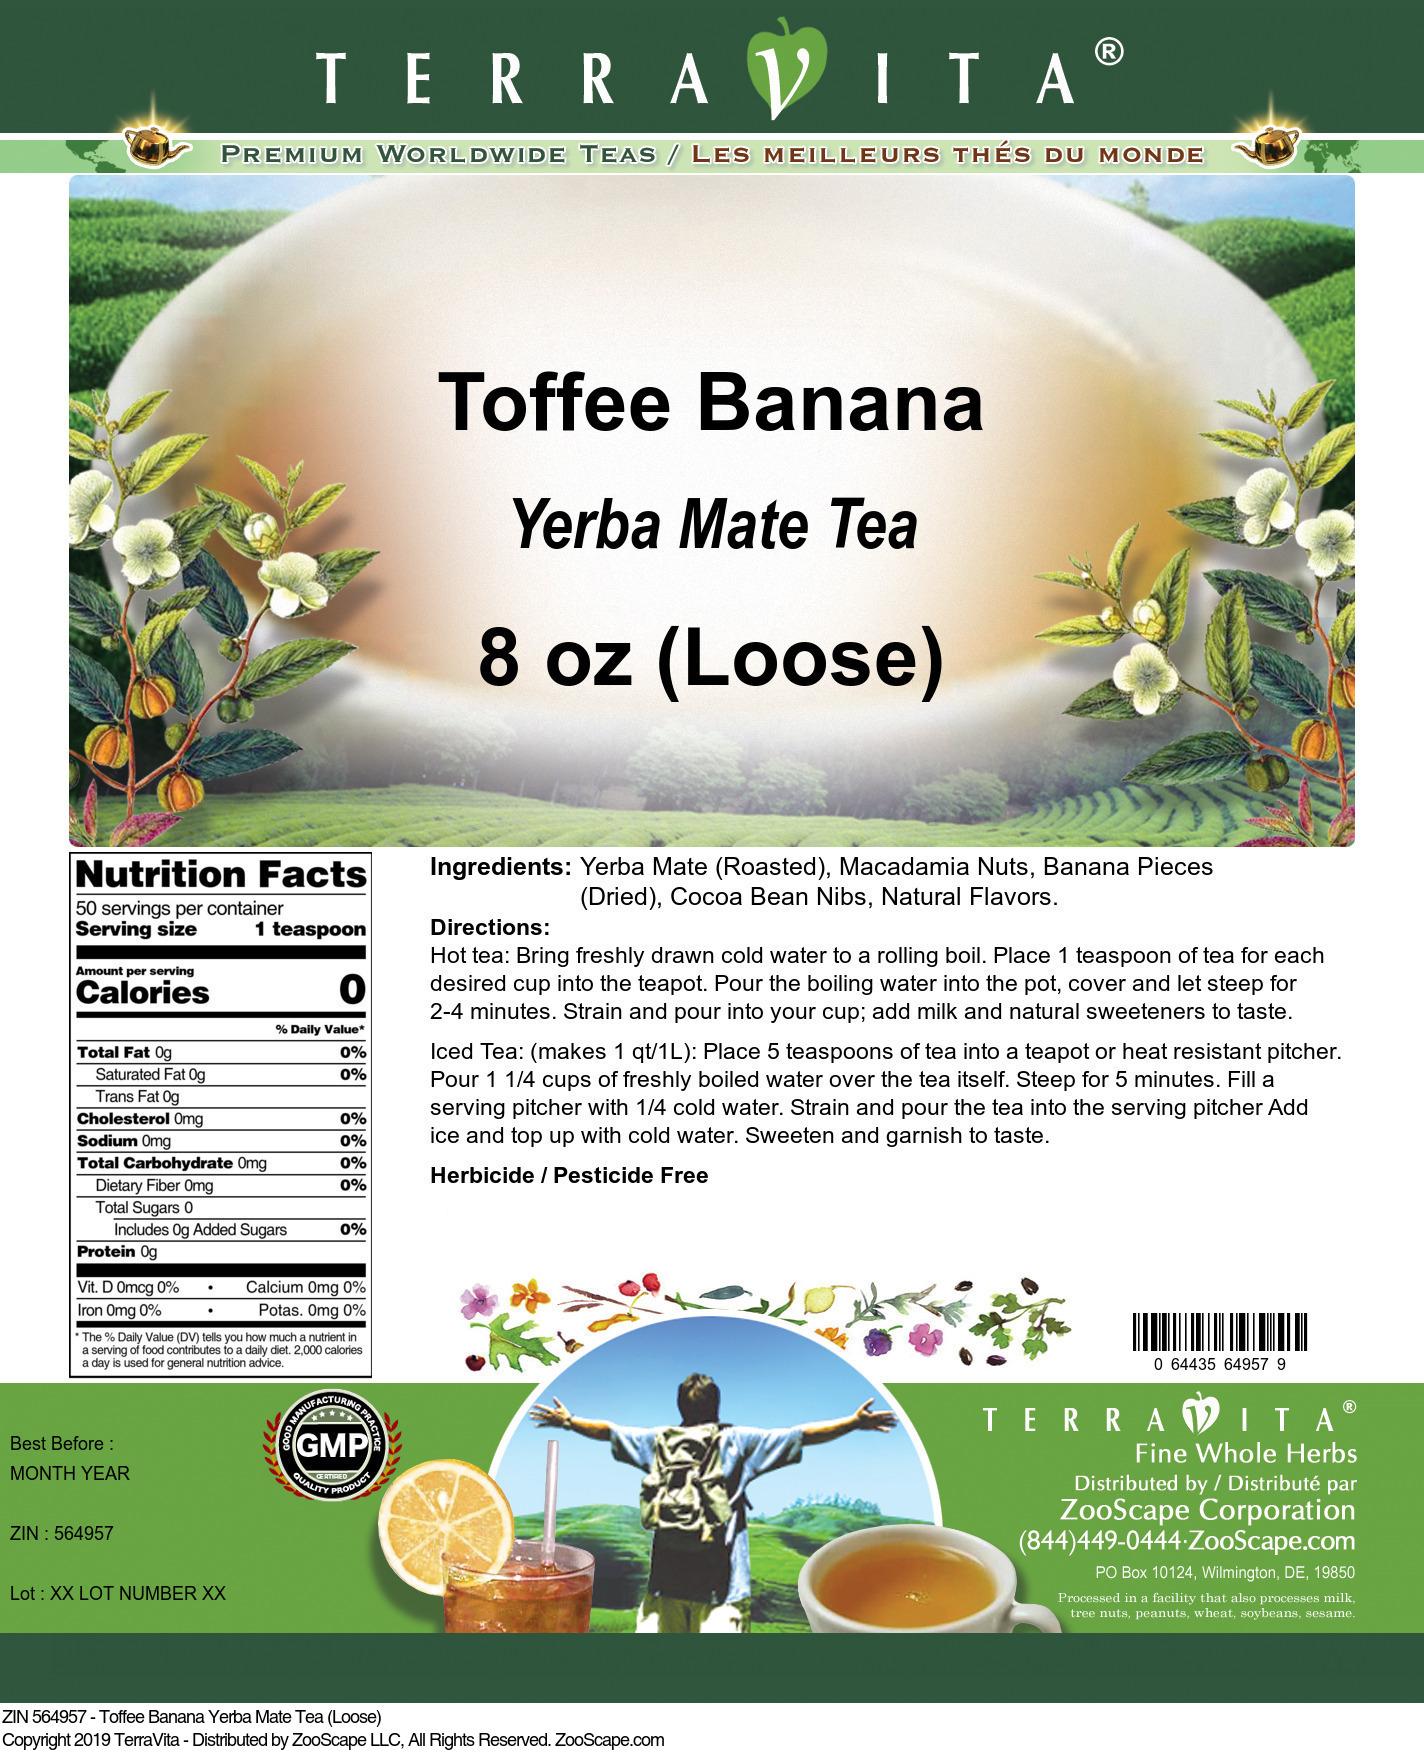 Toffee Banana Yerba Mate Tea (Loose)